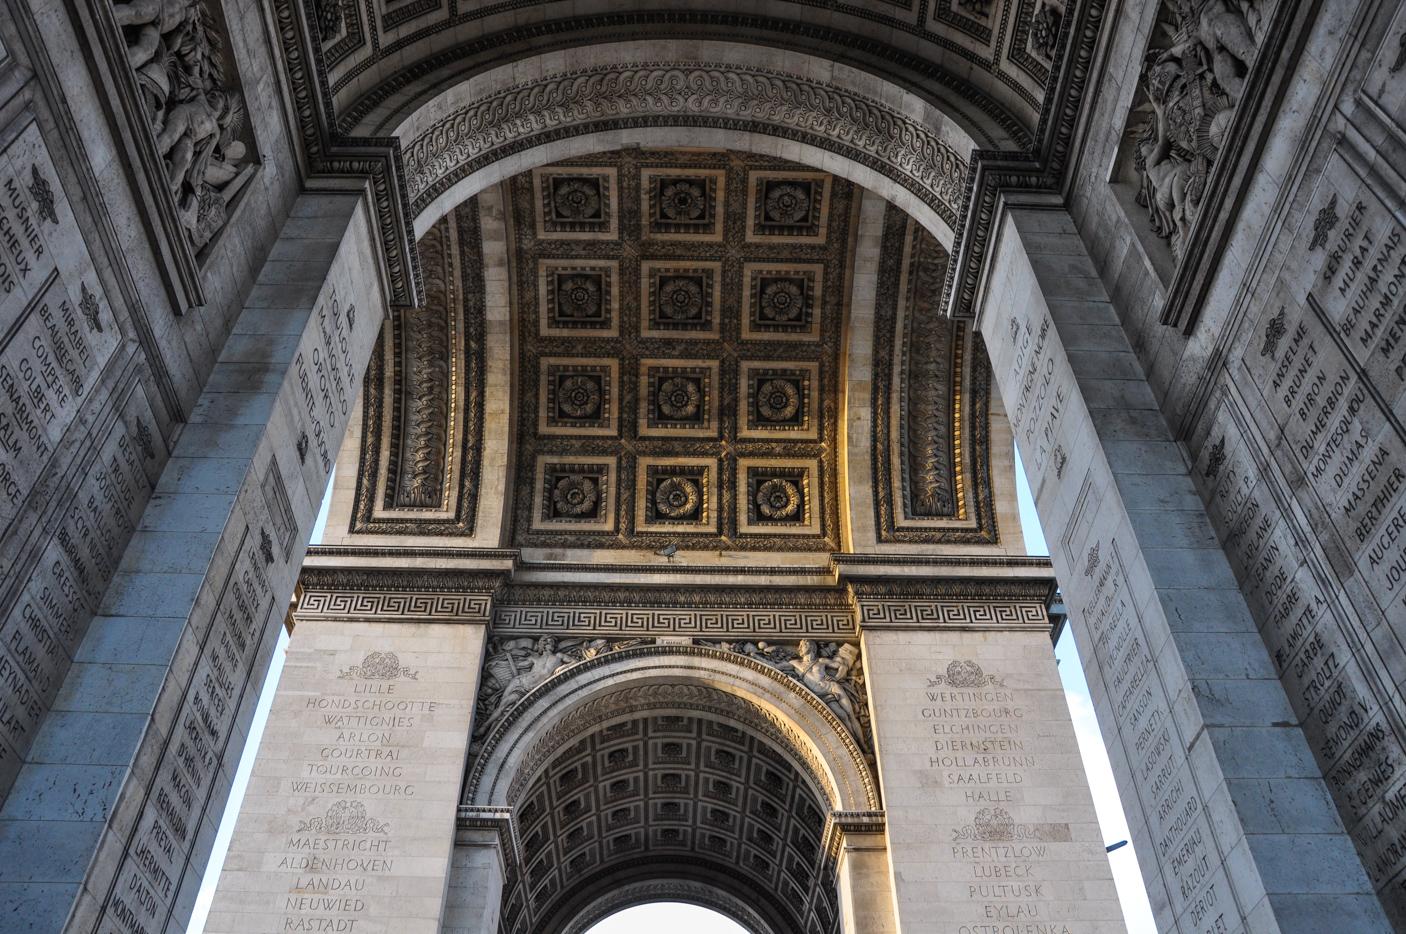 arco-del-triunfo-paris-francia-historia--6.jpg